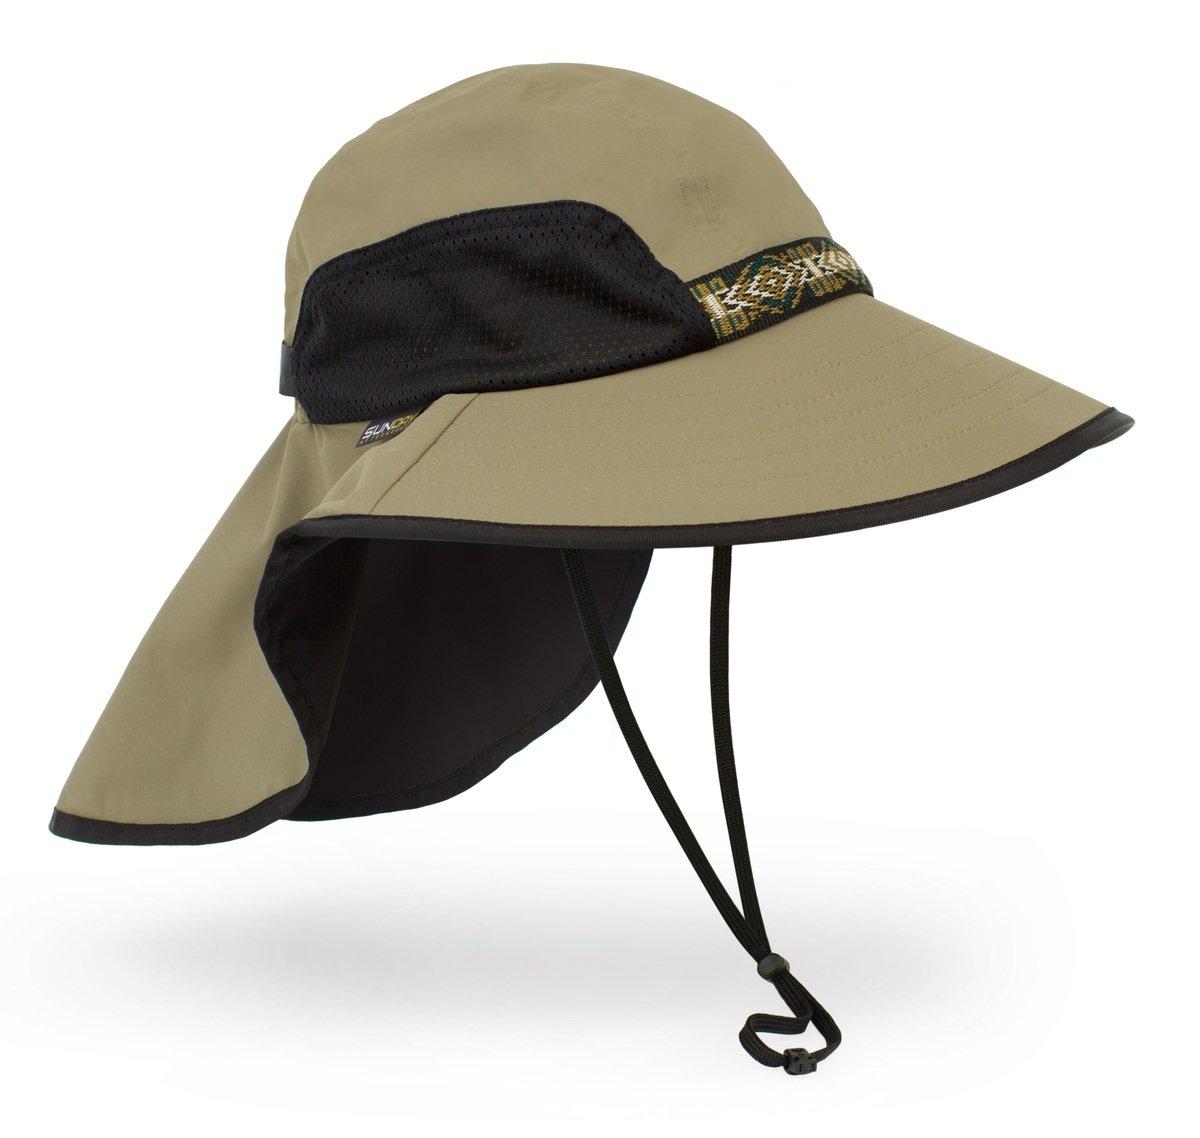 美國永久最高防曬帽 - Adventure Hat, sand, L